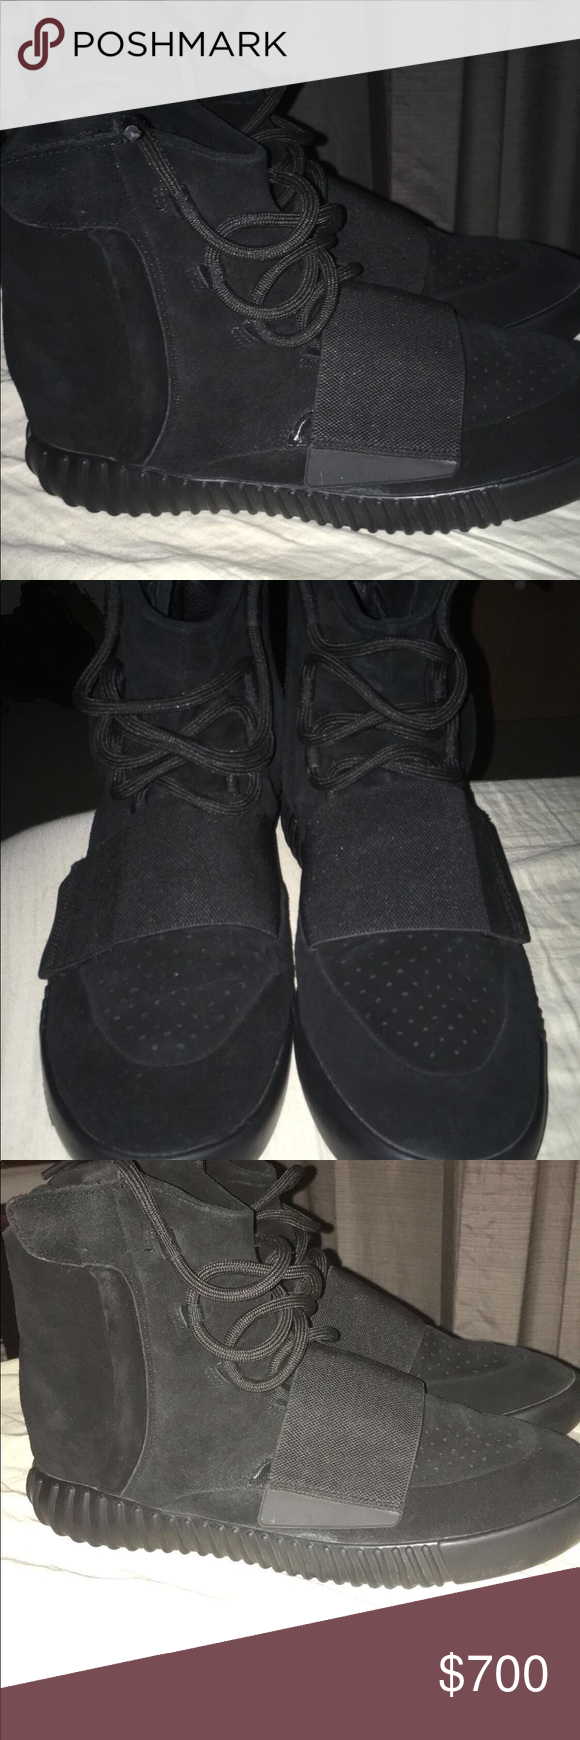 21694bf95 Adidas yeezy boost 750 triple black